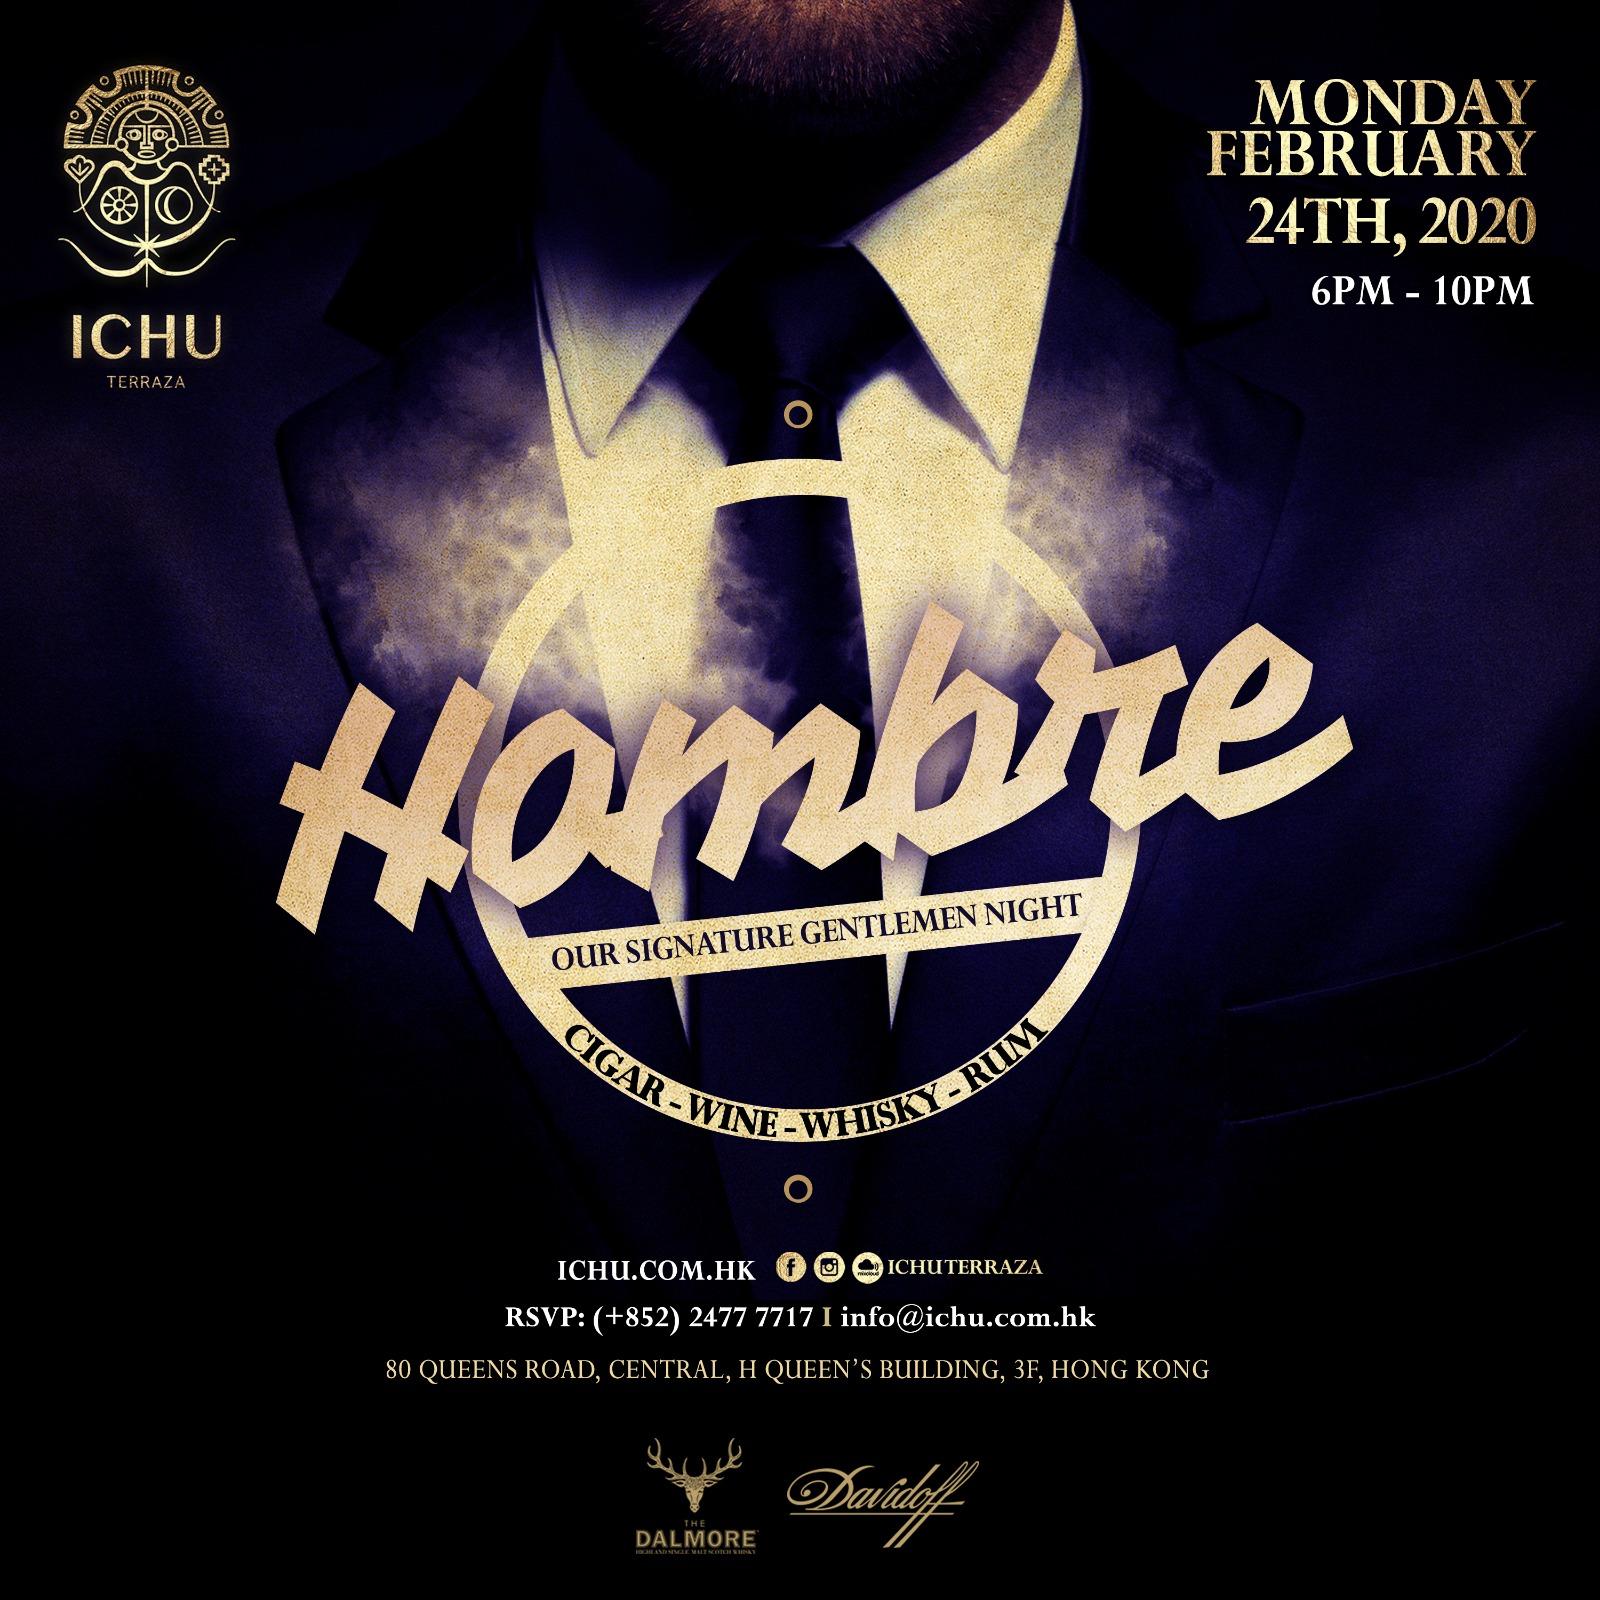 ICHU Restaurant & Bar | Events | Hombre